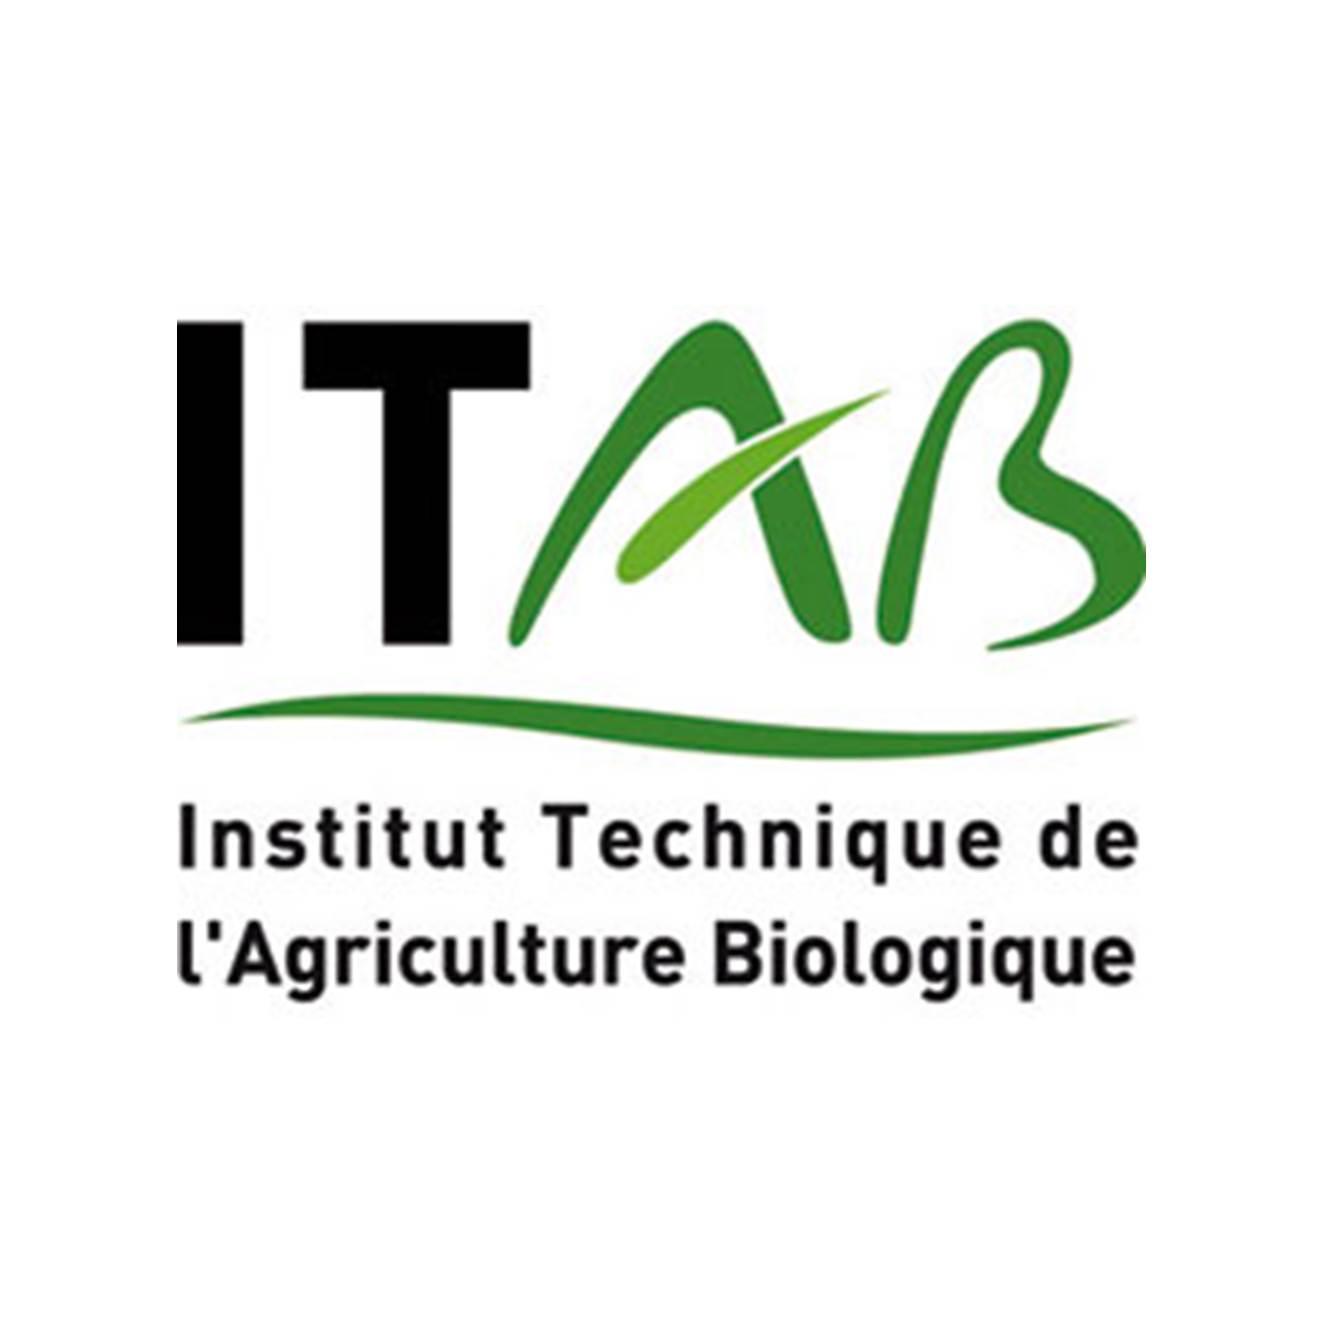 Institut technique de l'agriculture biologique